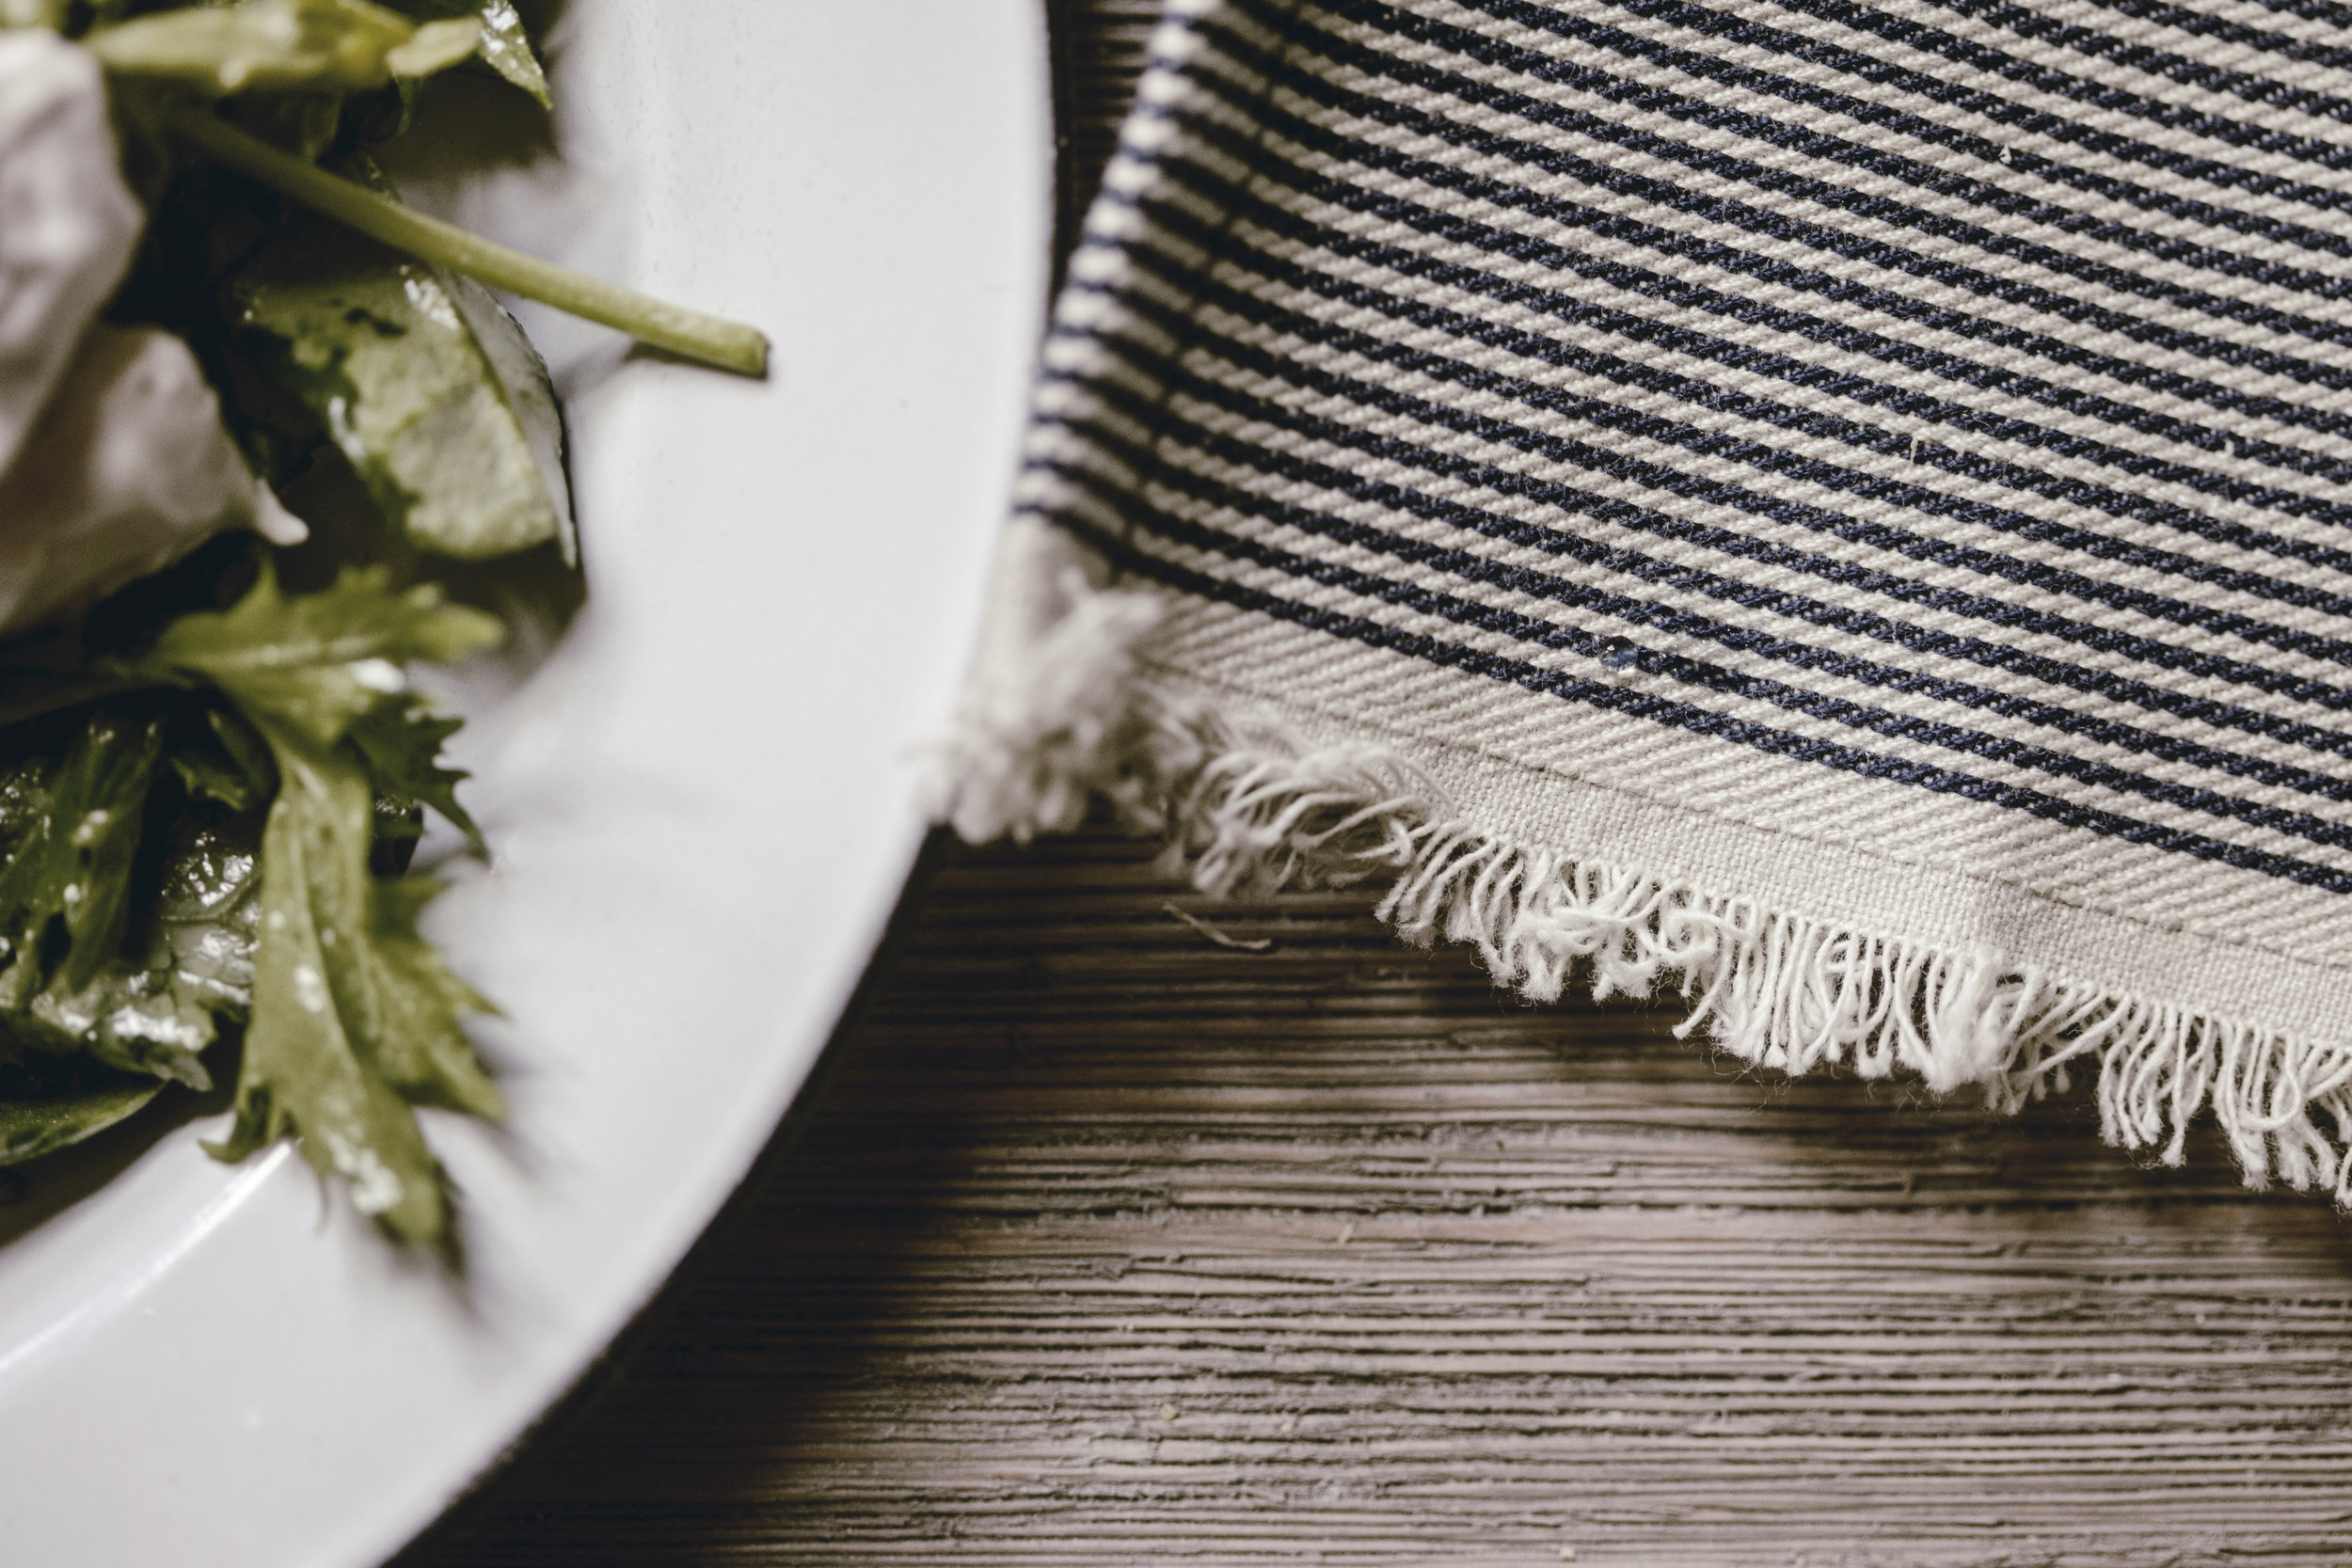 detail of selvedge edge railroad stripe tea towel / heirloomed